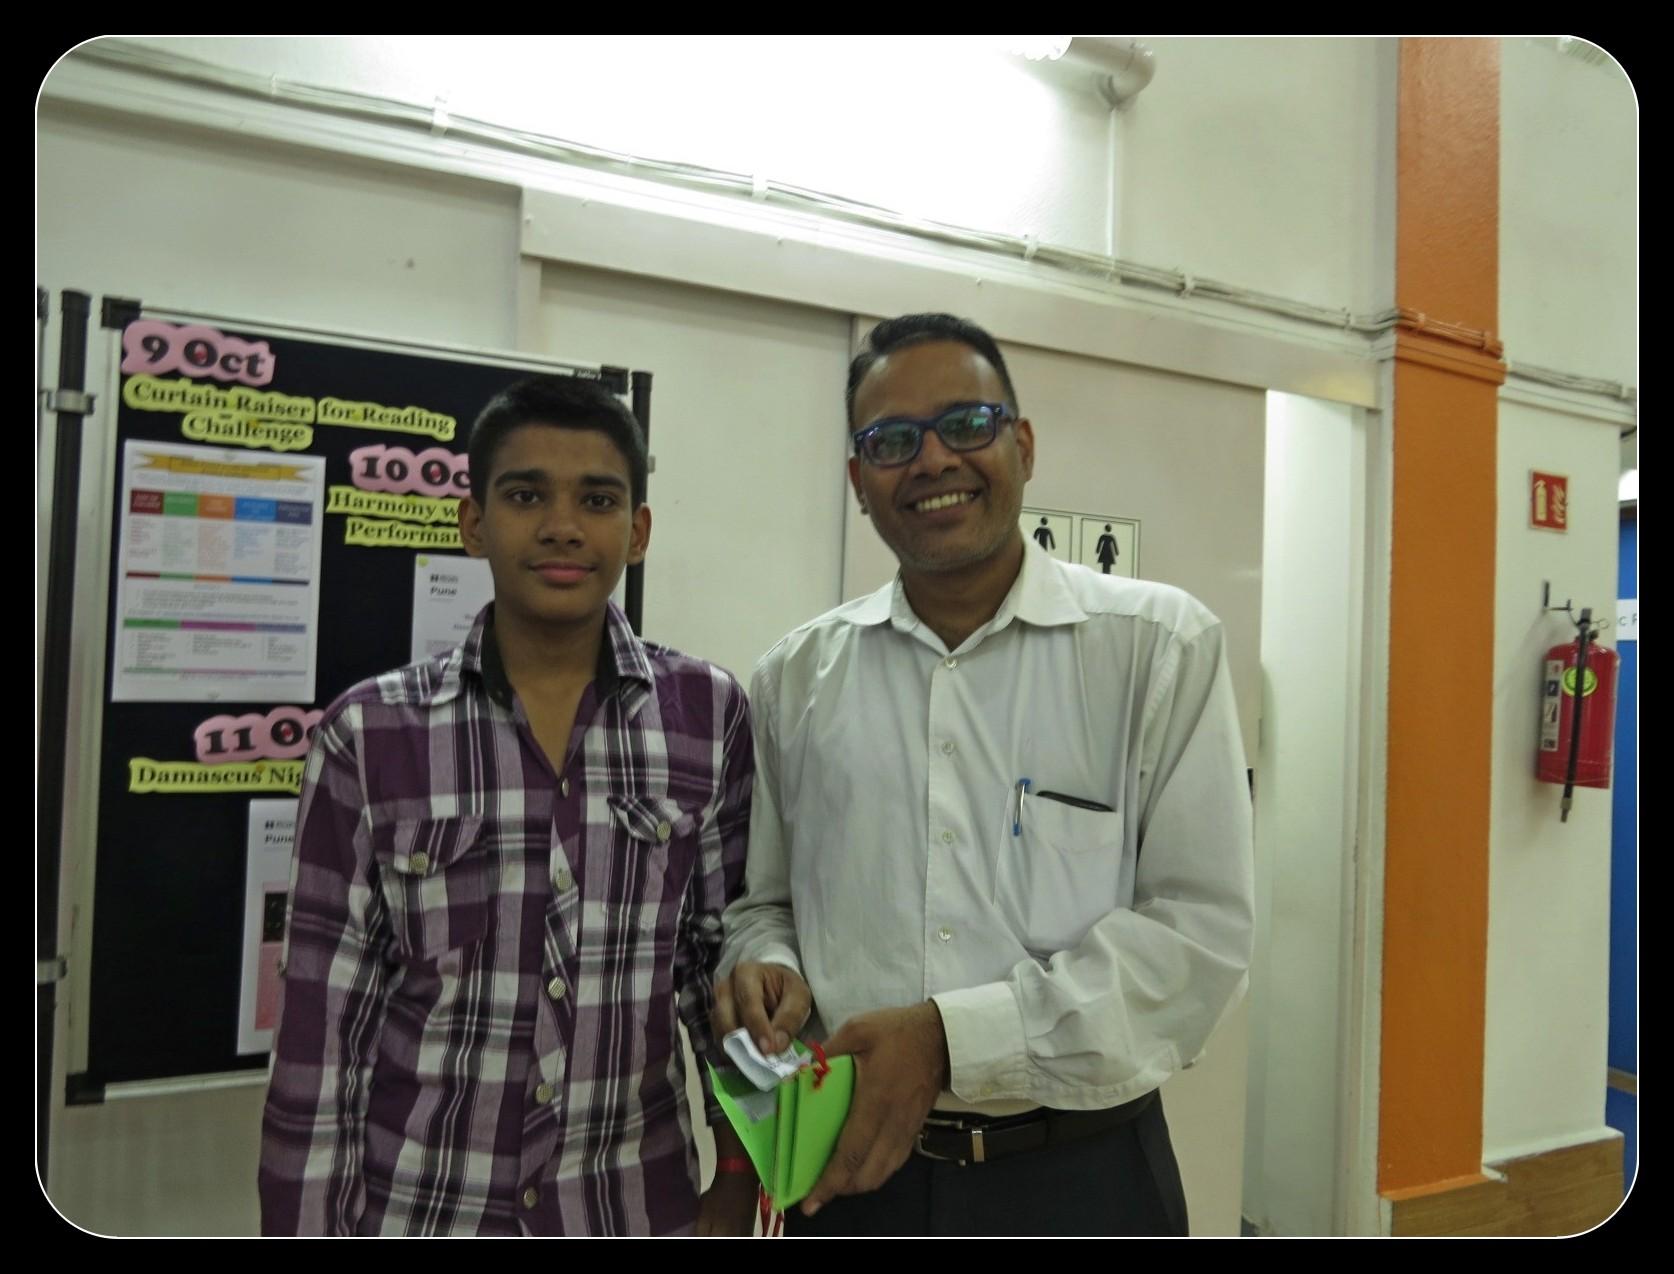 Atharva & Ashwin, the winners